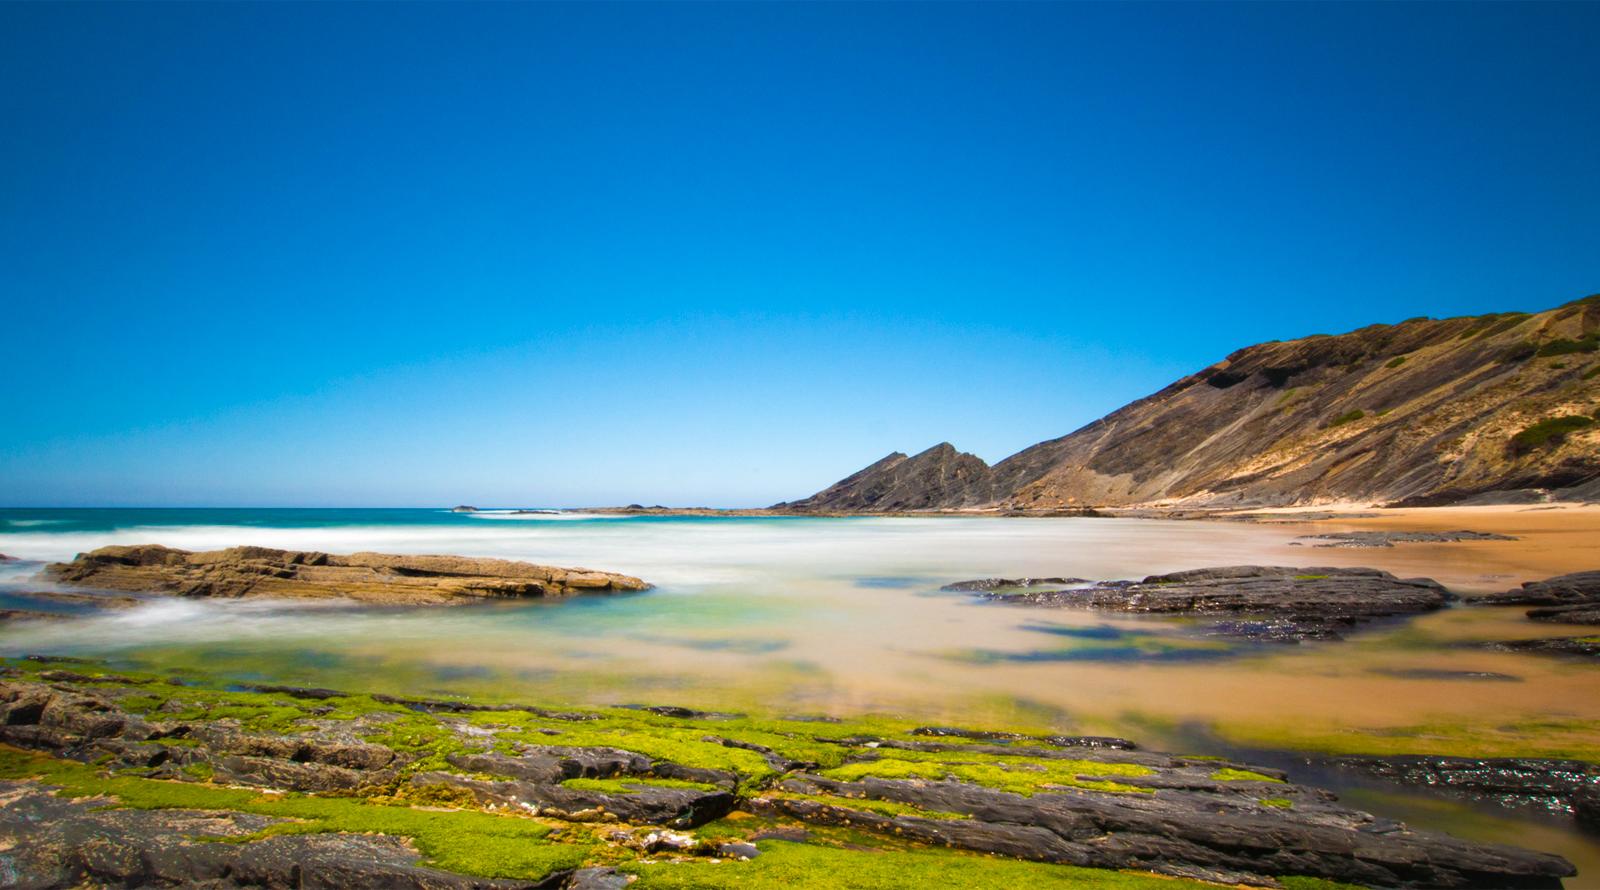 Praia da Amoreira Trail Main